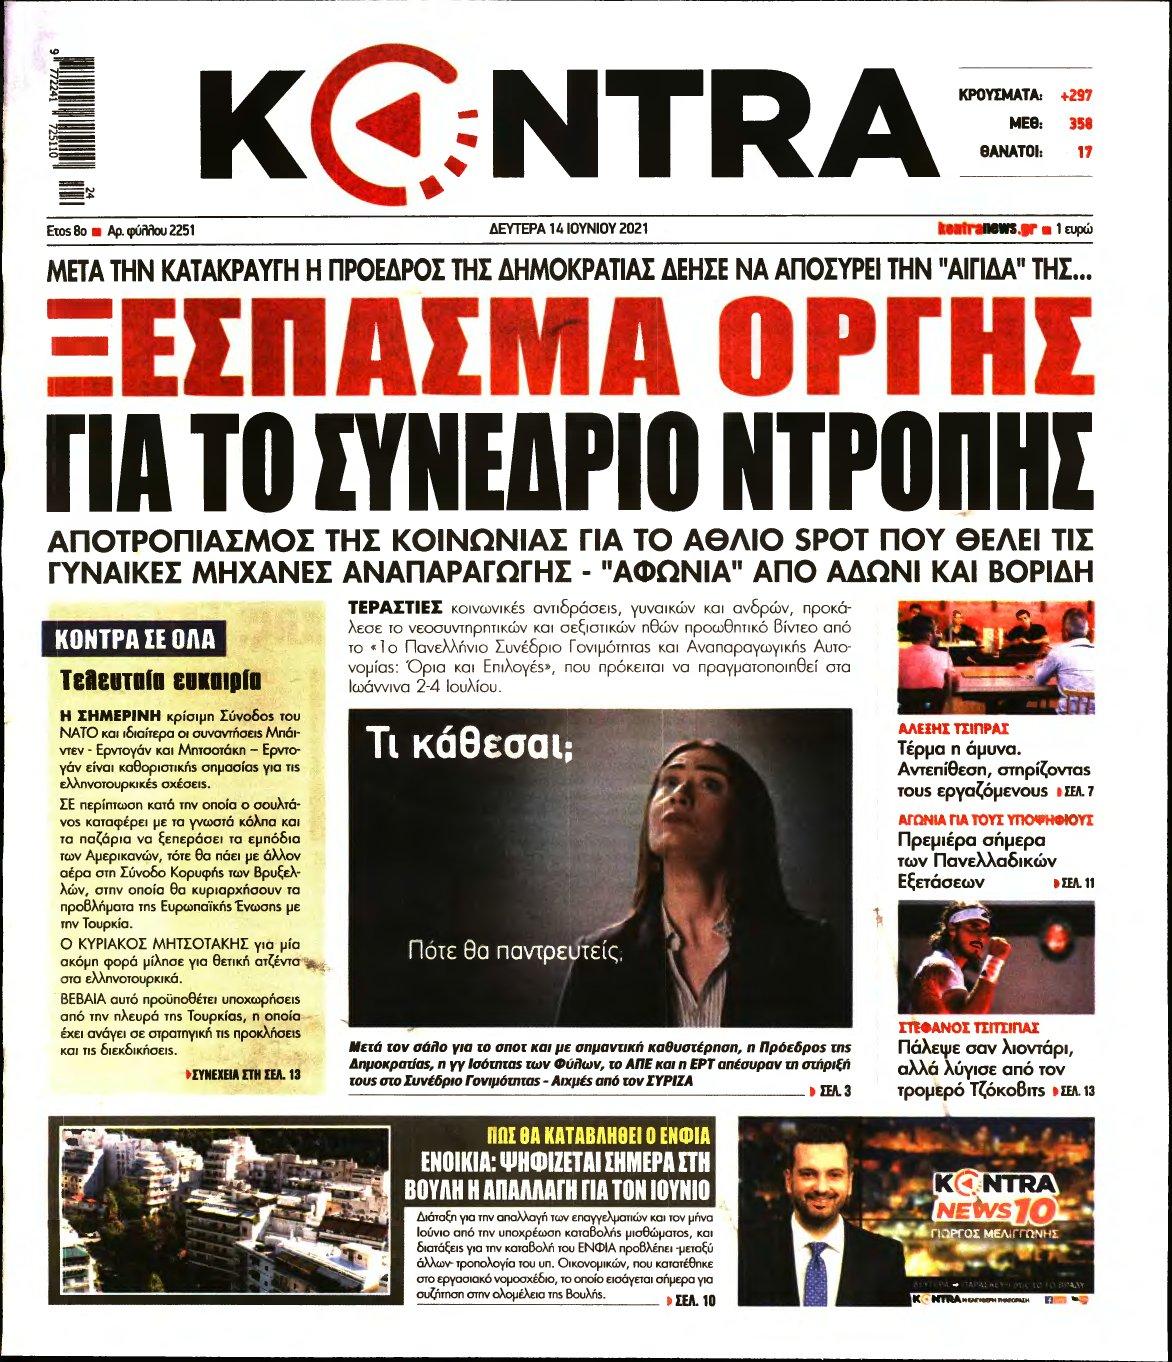 KONTRA NEWS – 14/06/2021